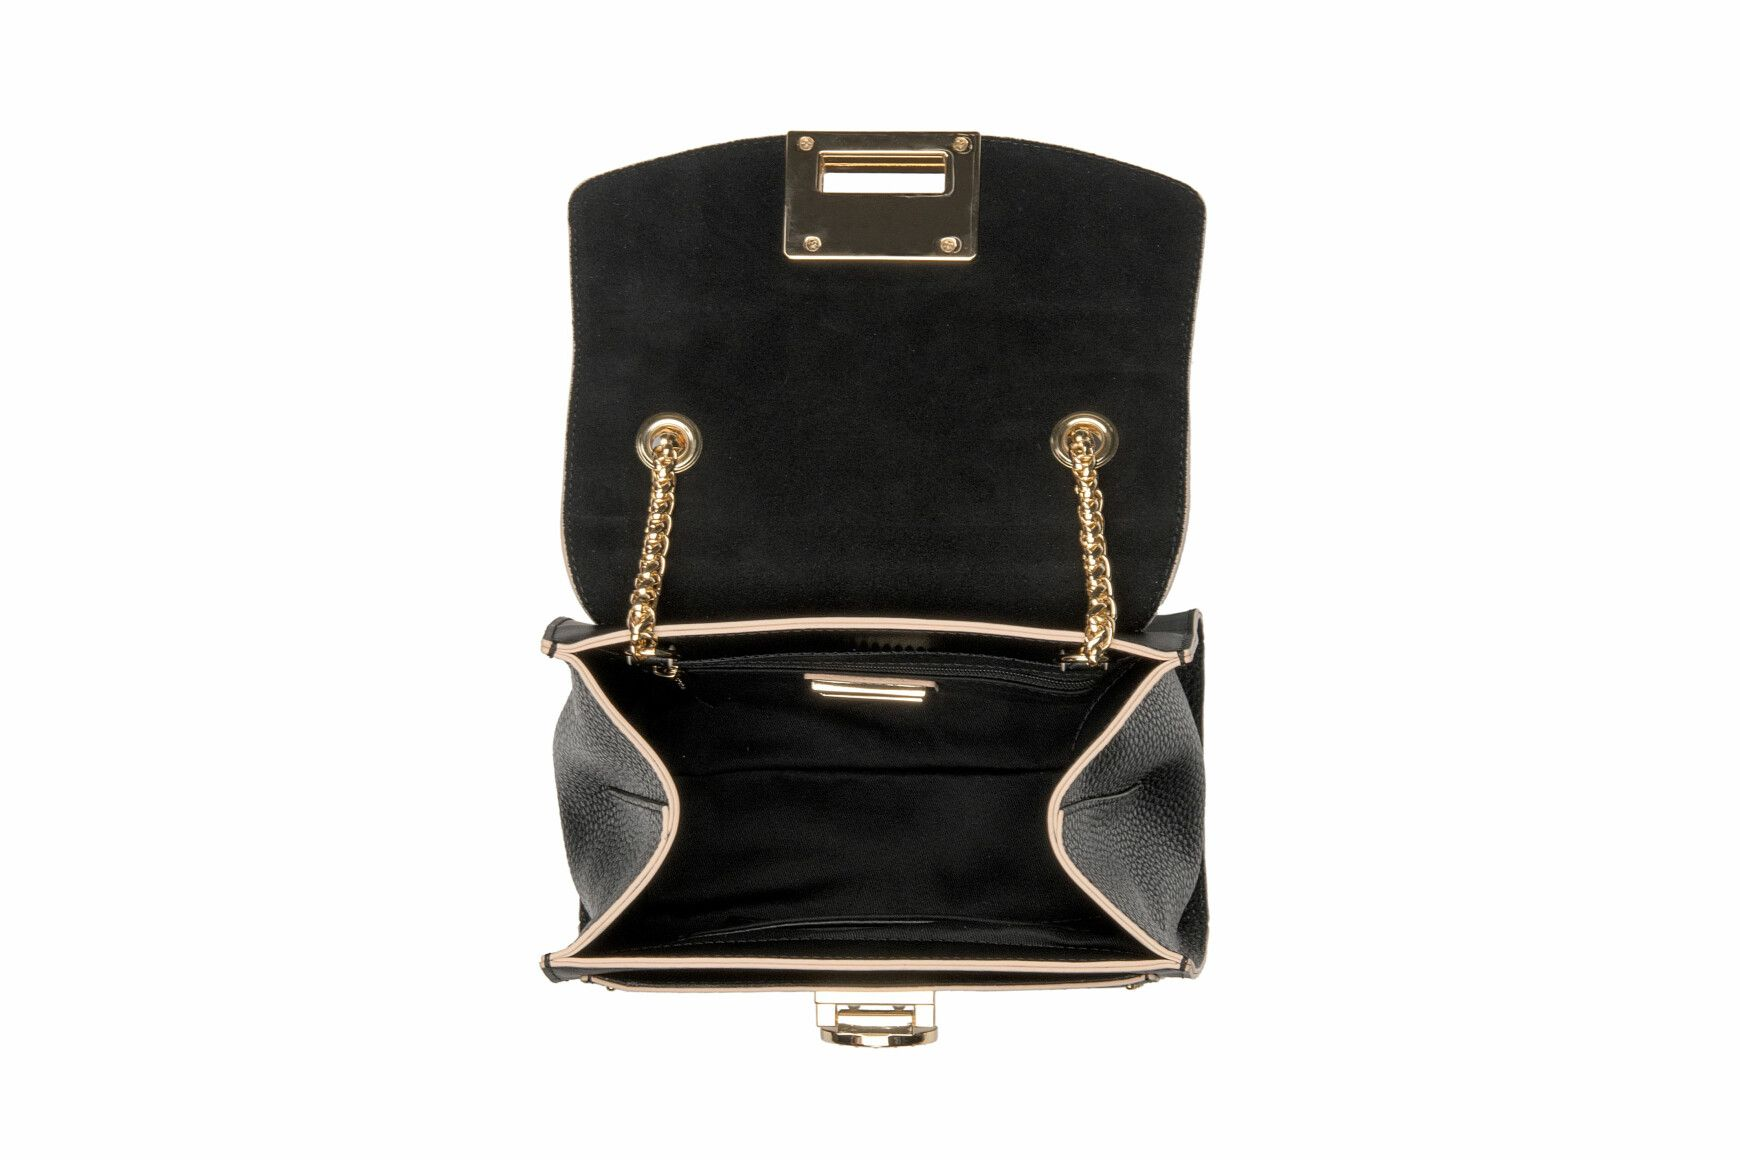 aa0ad03ad57c Купить сумку из из гладкой телячьей кожи Nubia Cromia Украина - Estro